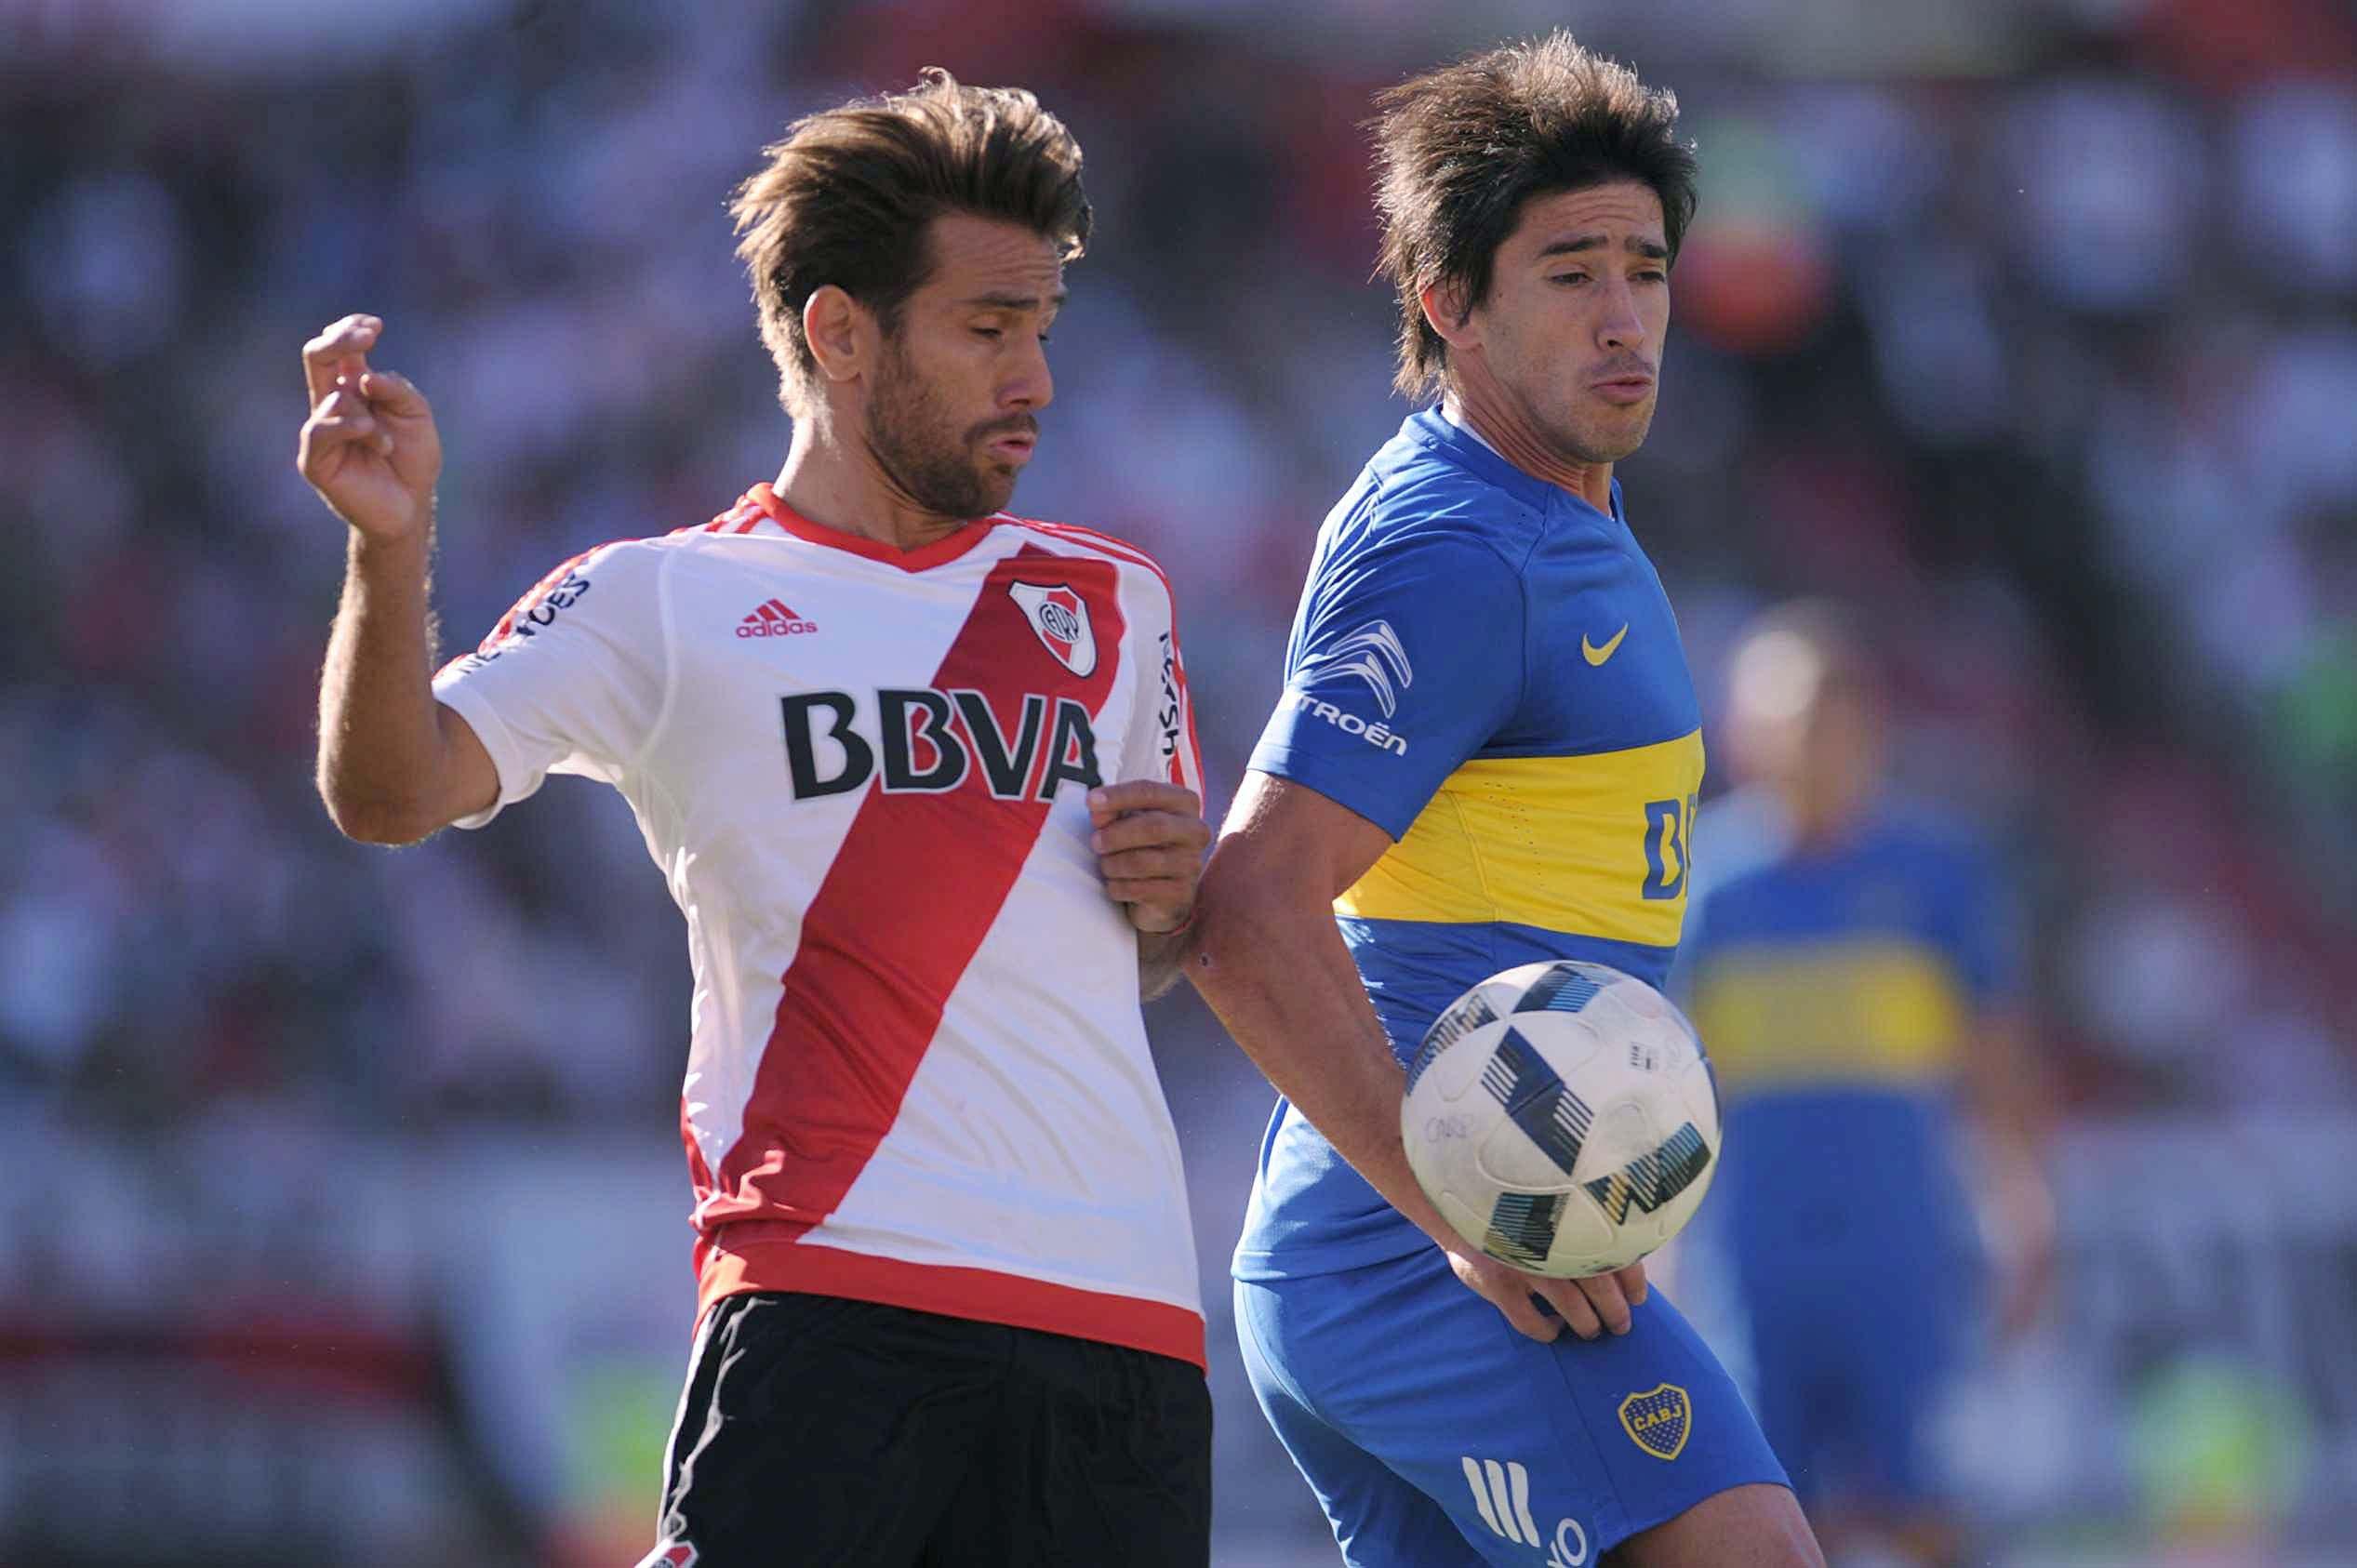 Por pedido de Barros Schelotto, Pablo Pérez se quedará en Boca